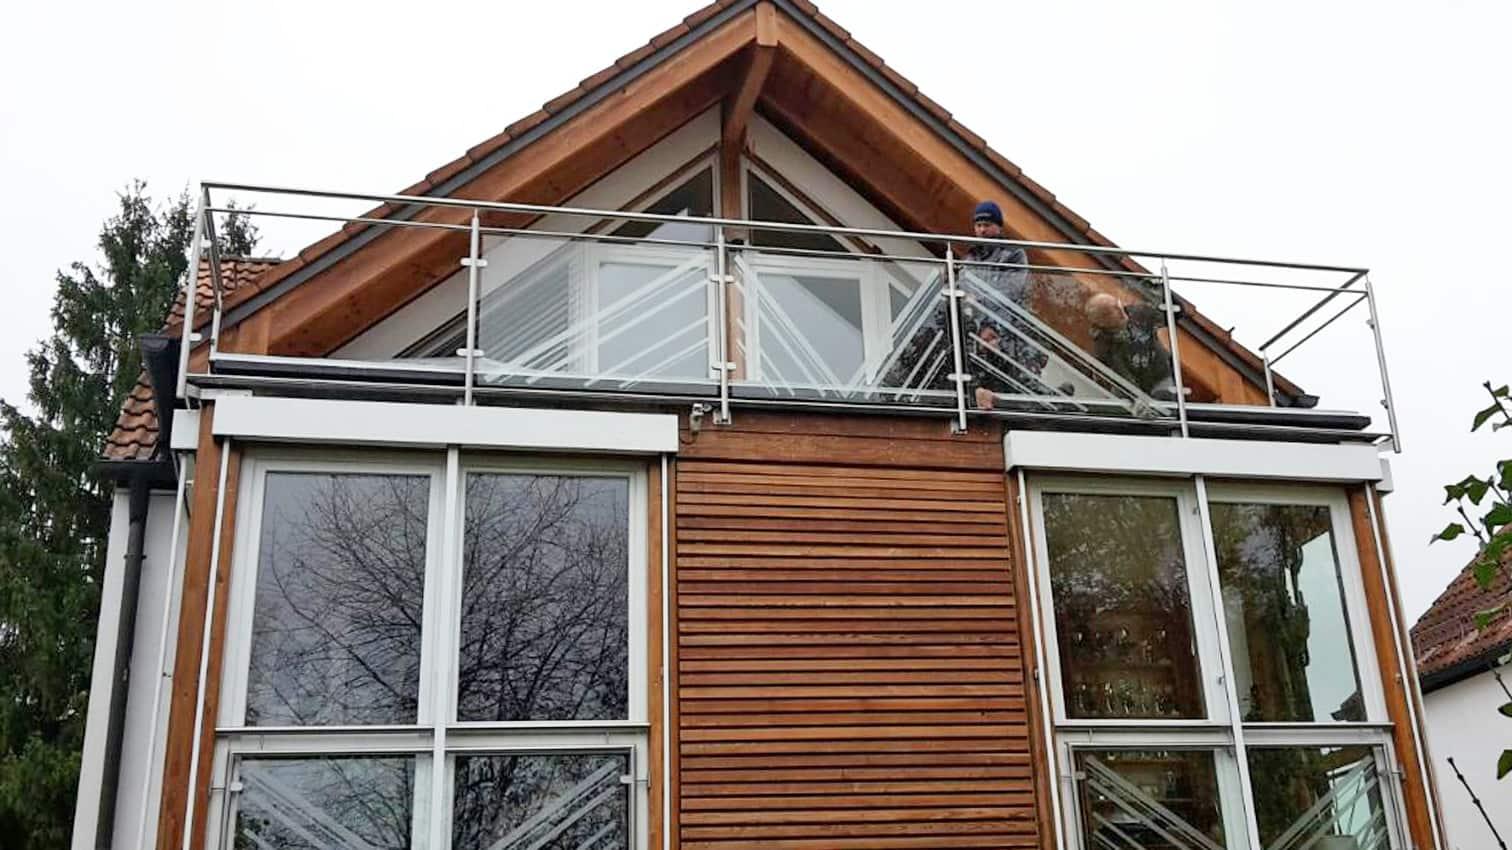 Balkon aus Edelstahl